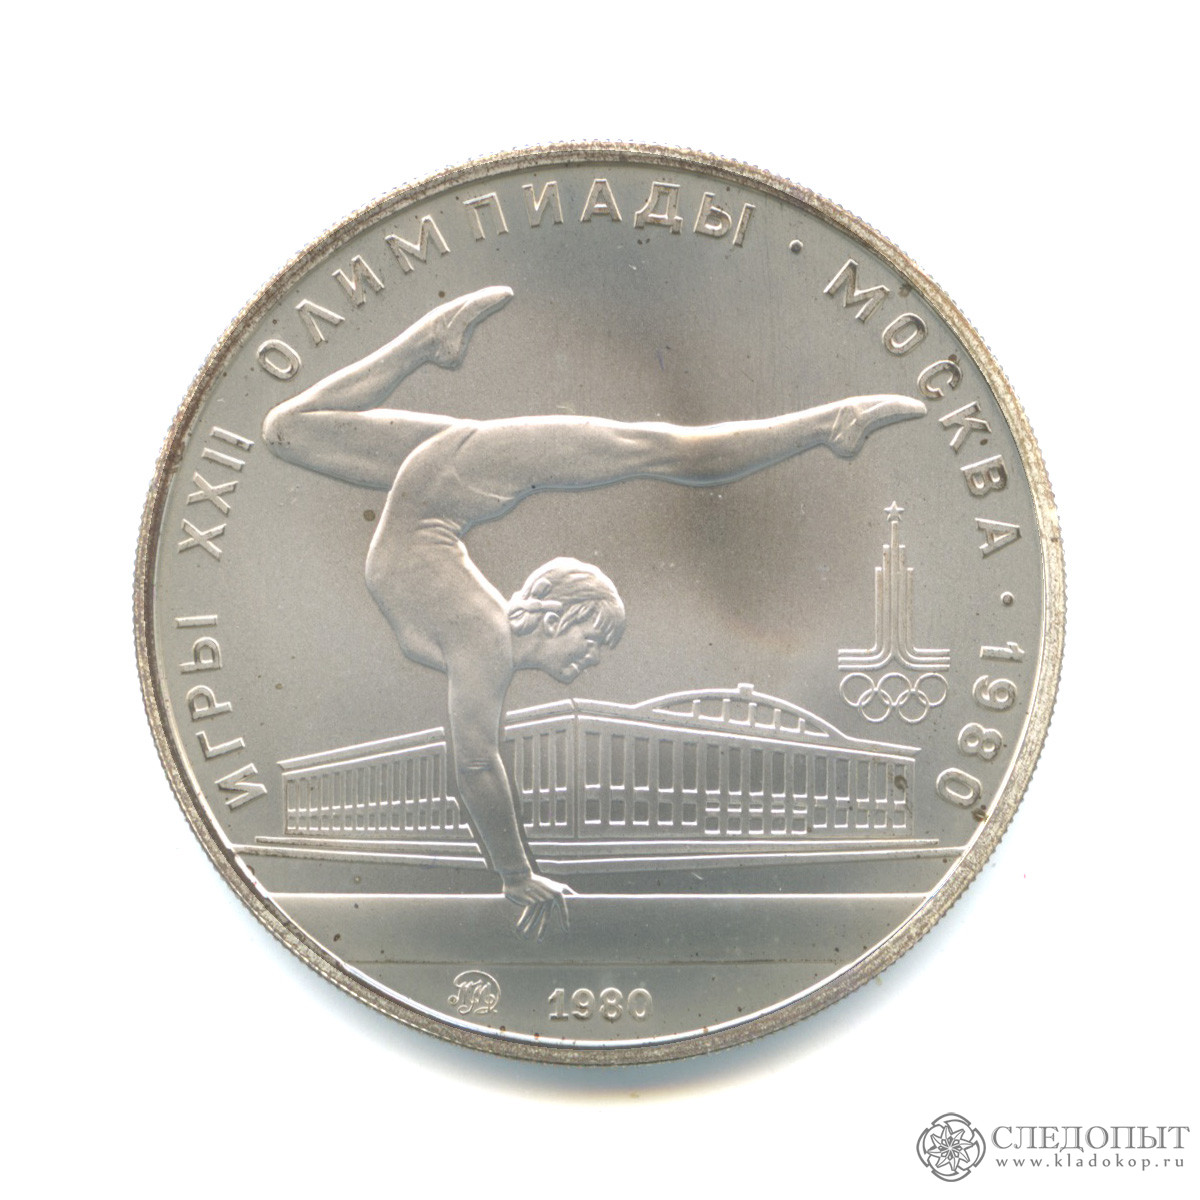 5 рублей 1980— Гимнастика